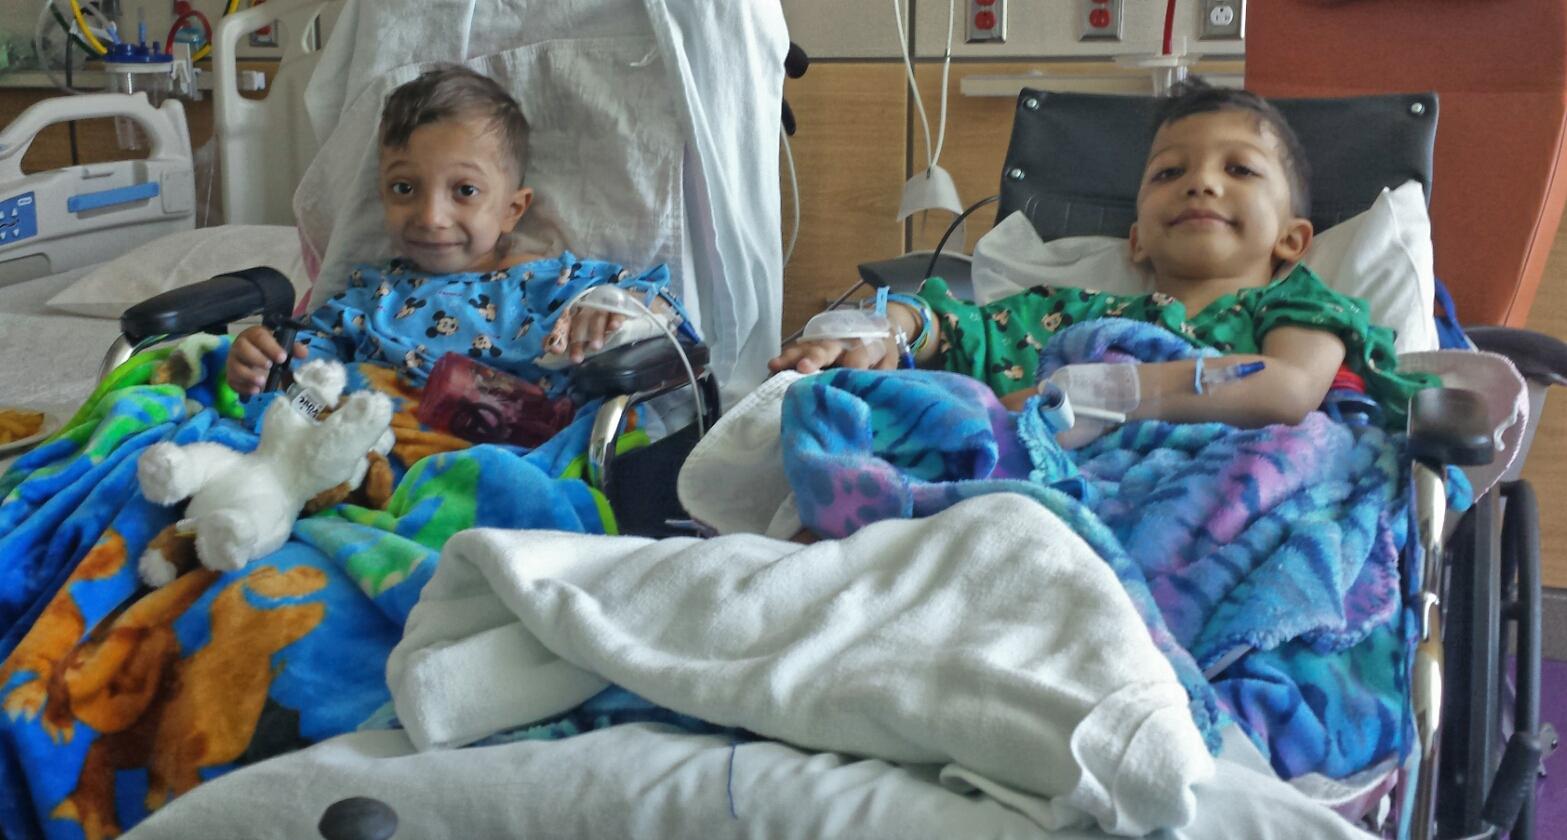 Bilateral femoral osteotomies, A I Dupont Hospial for Children, Delaware